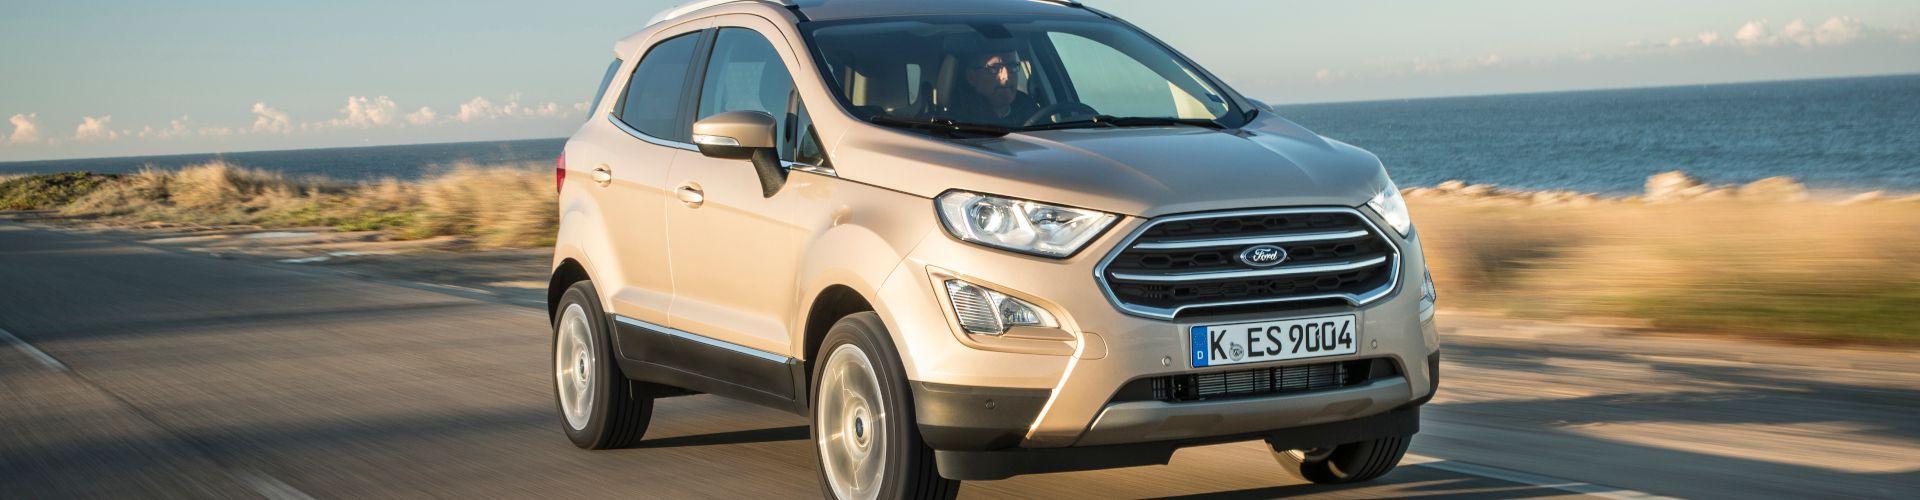 Ford Ecosport Connected - Α. Λιάπης Αντιπροσωπεία